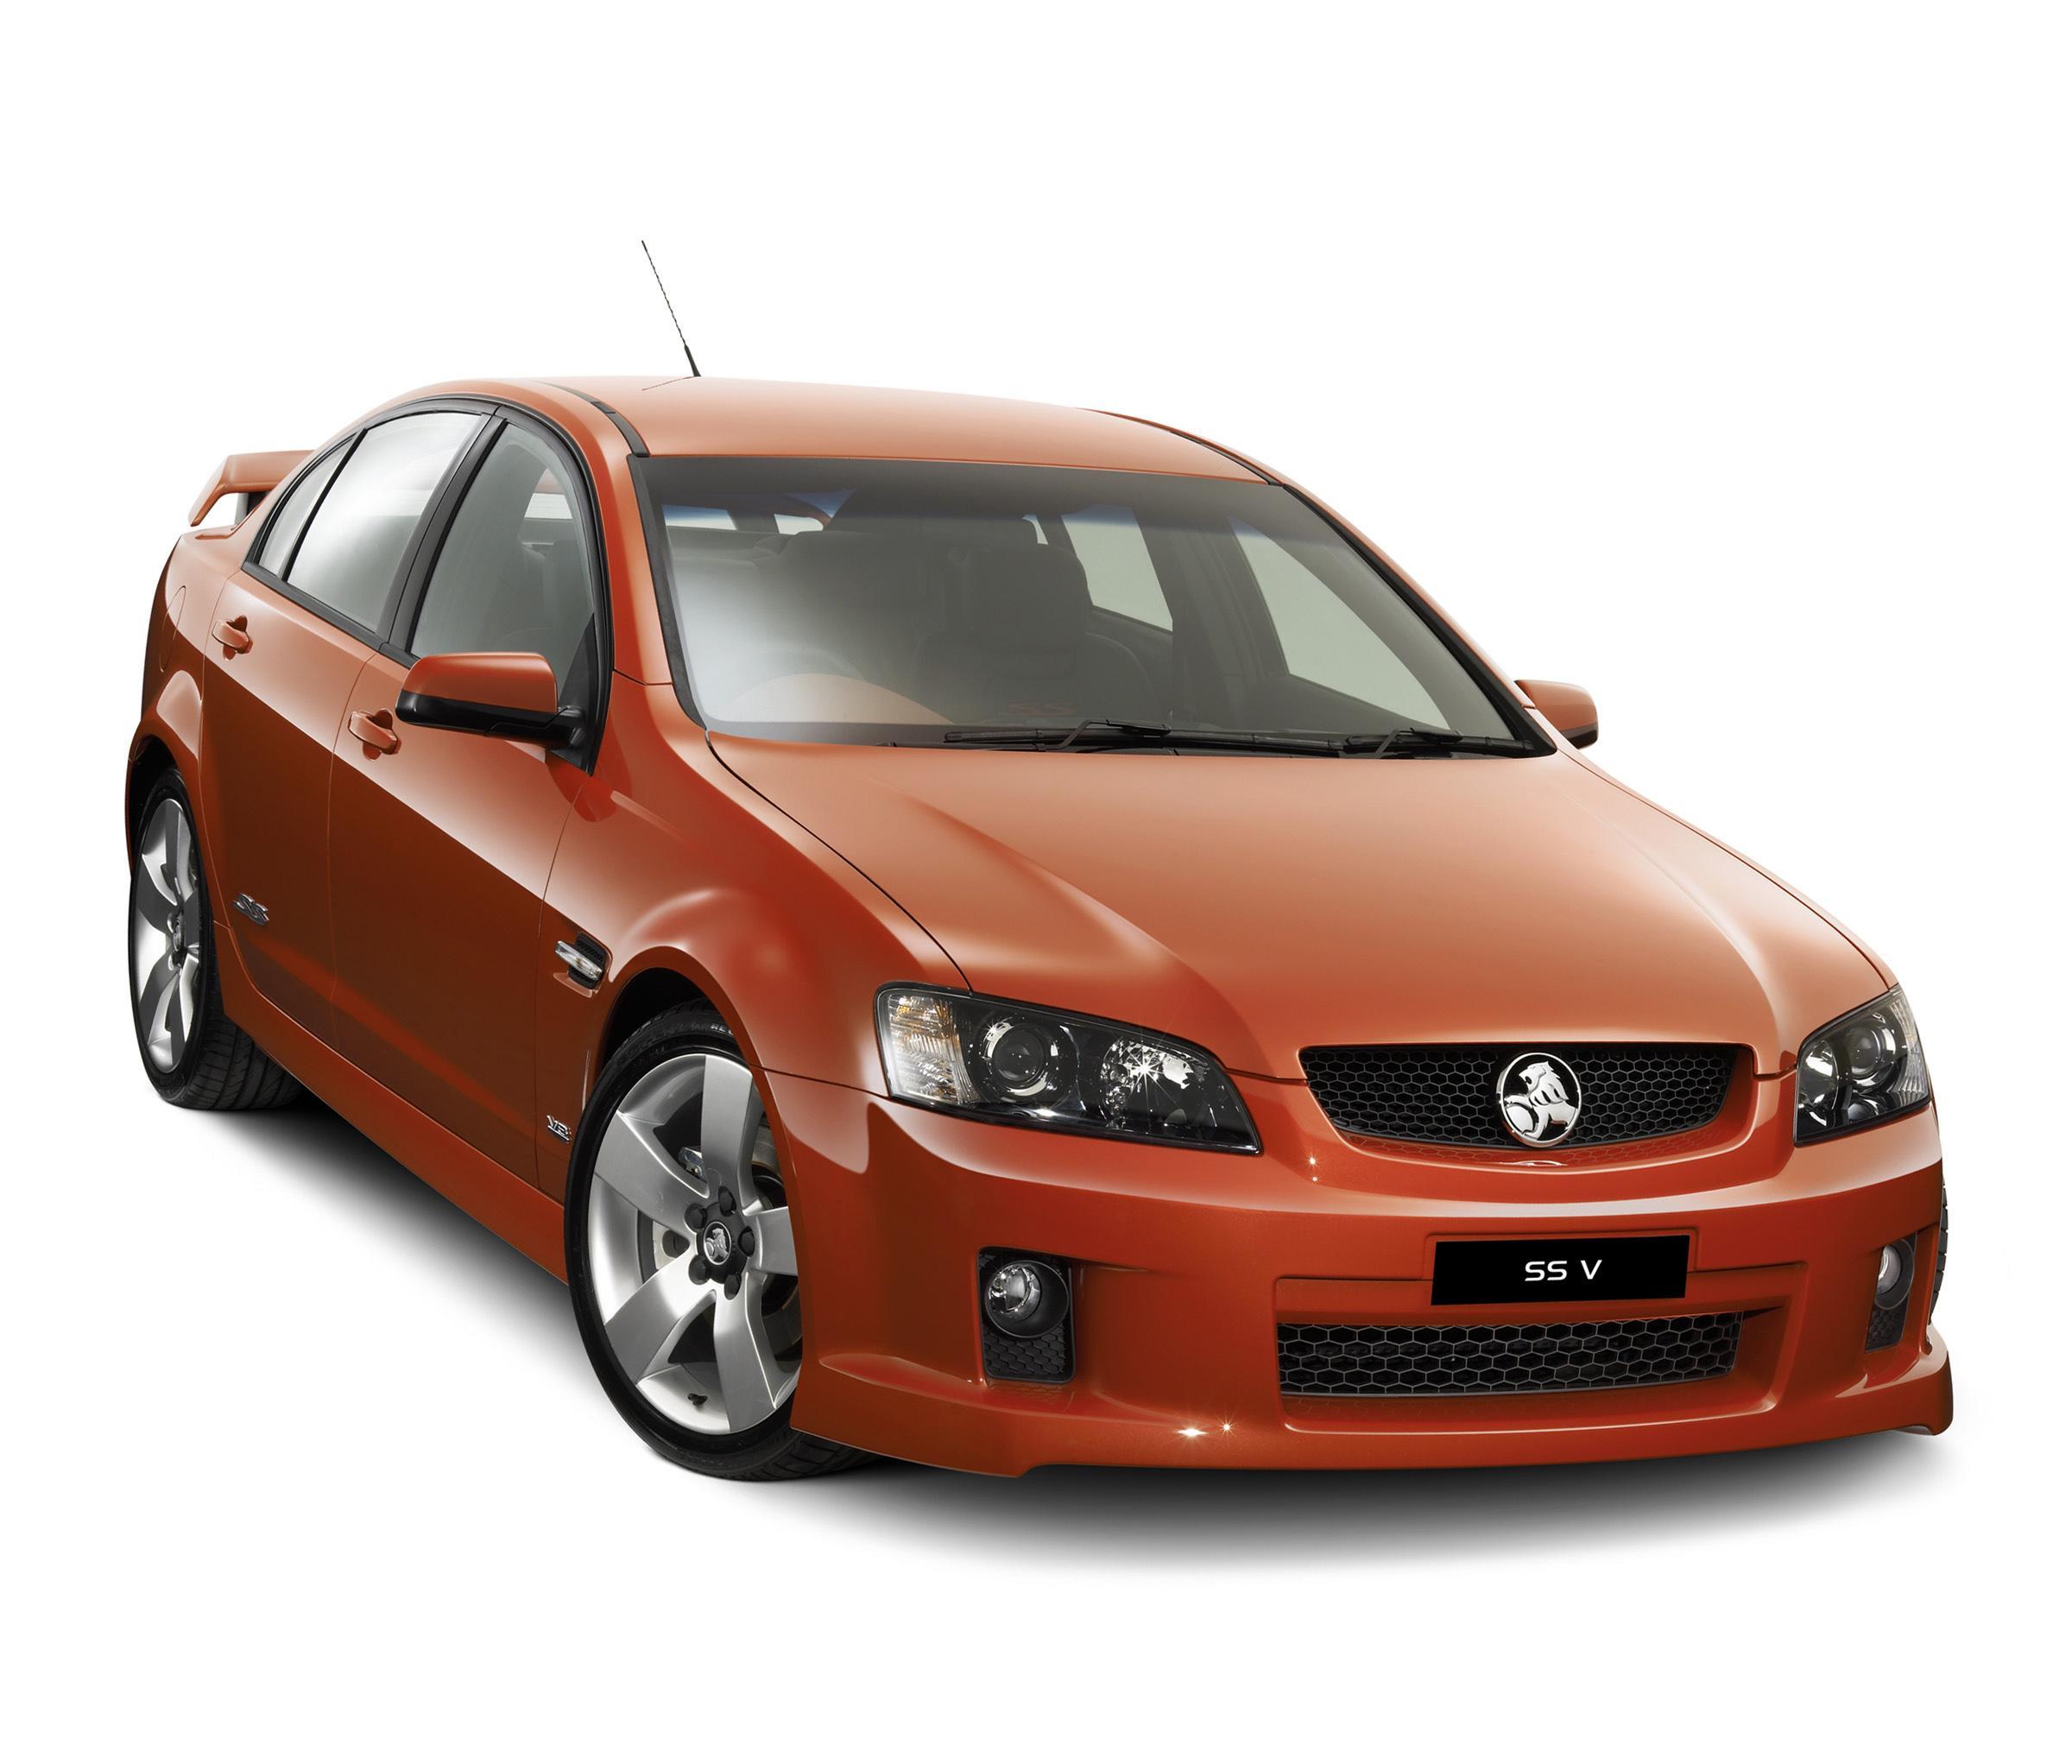 Holden Commodore III 1997 - 2006 Sedan #1